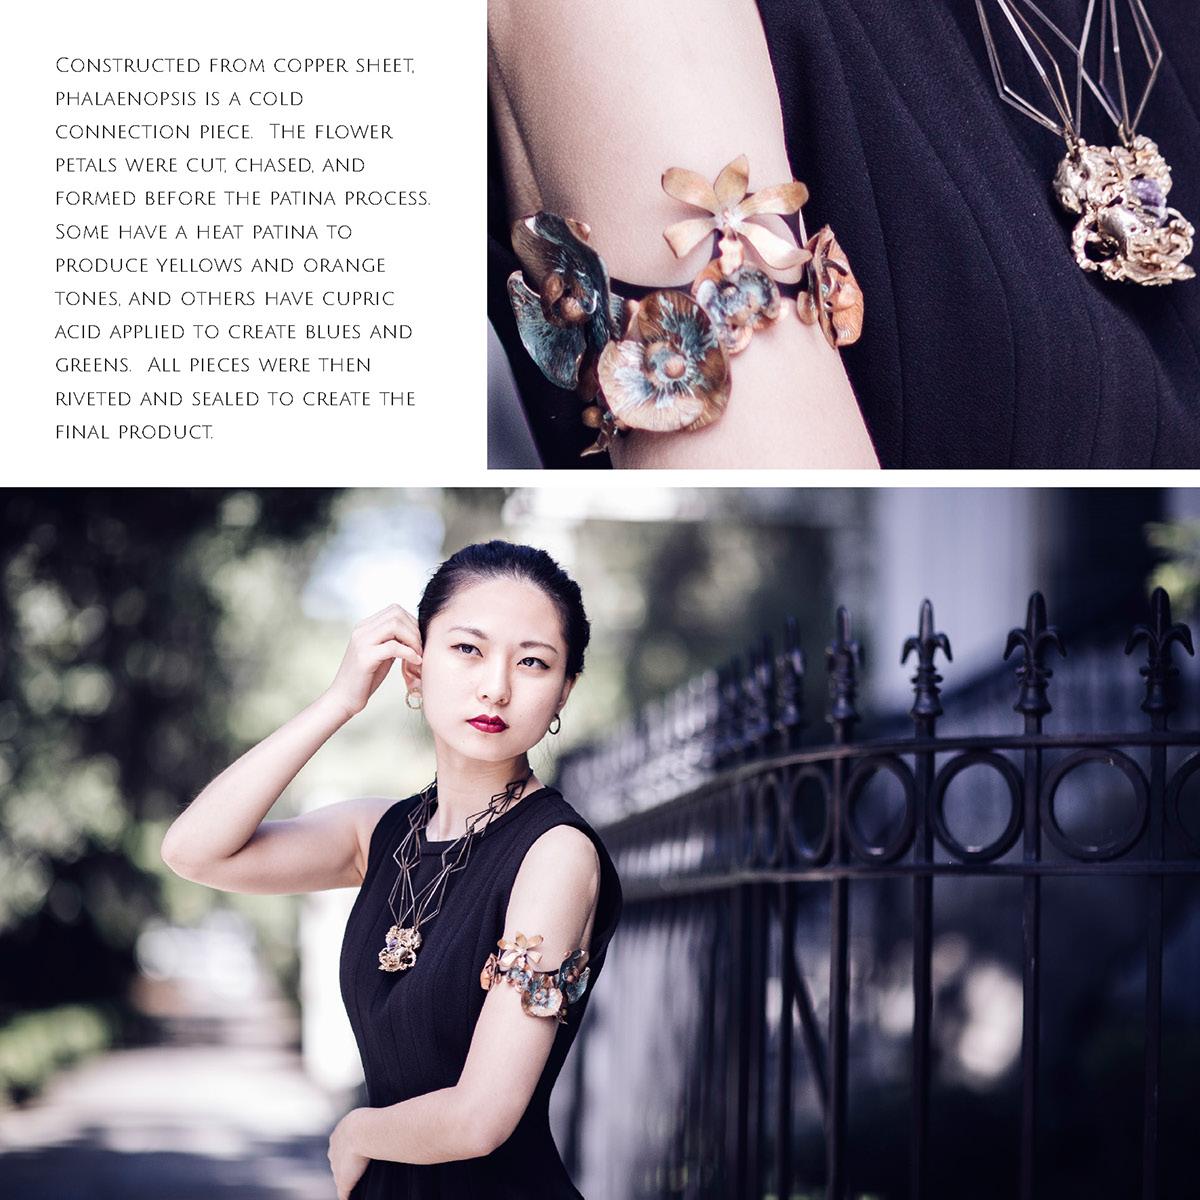 jewelry flower floral cuff bracelet patina riveting art design Beautiful